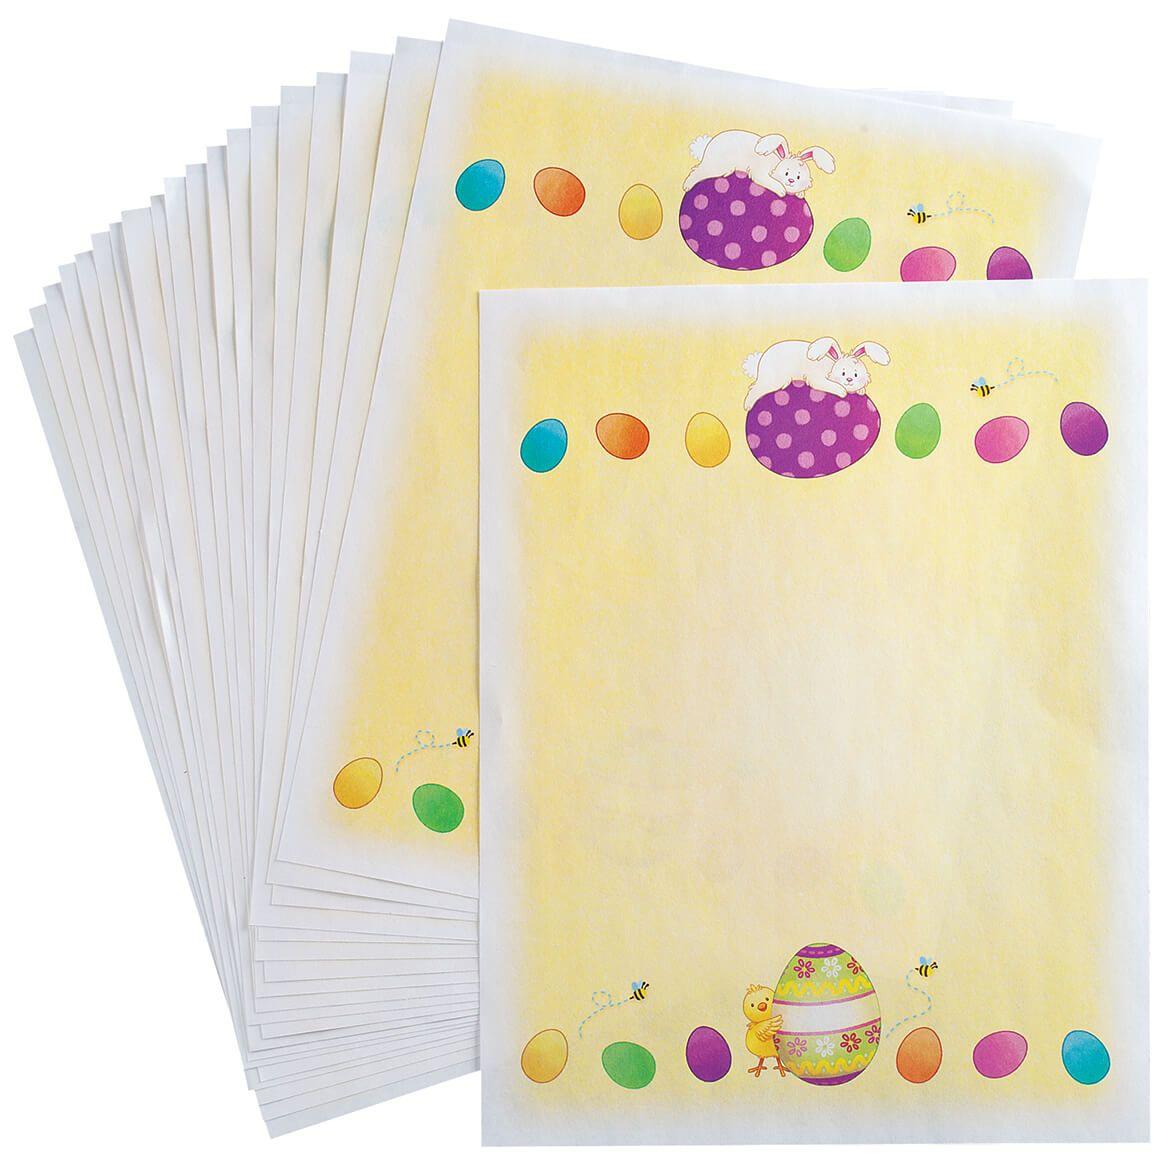 Children's Easter Stationery Sheets, Set of 20-370647